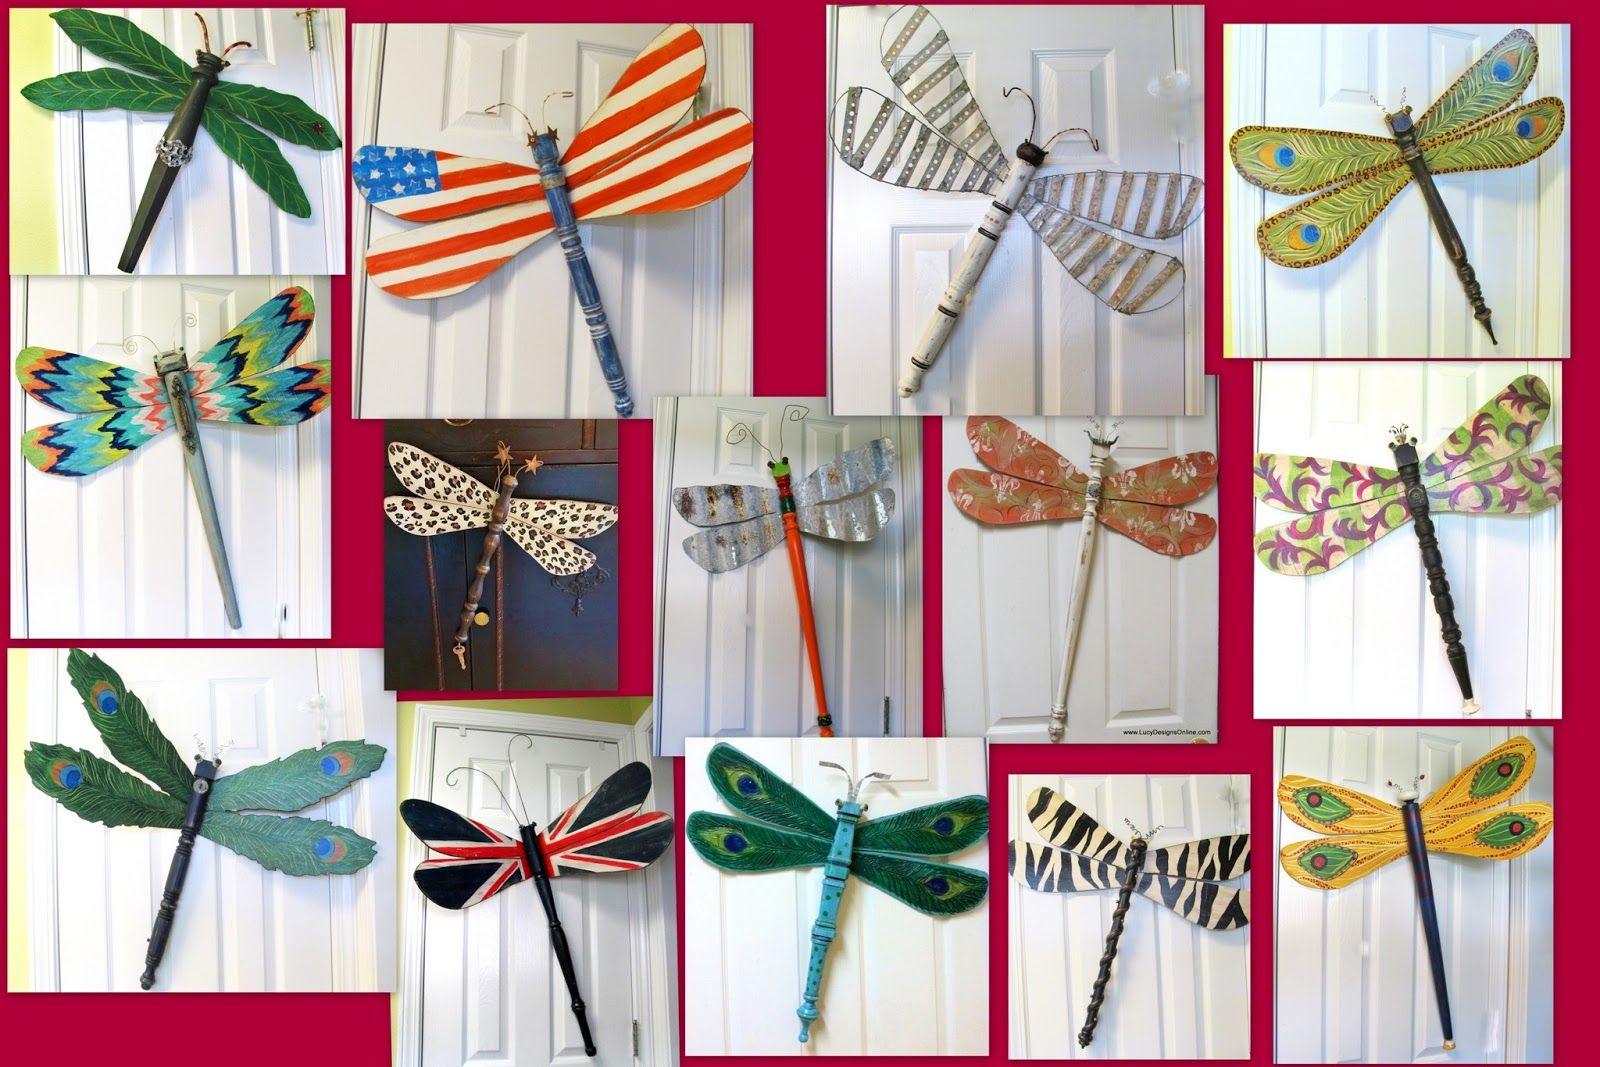 Fan Blade Dragonflies Table Leg Dragonflies Crafts